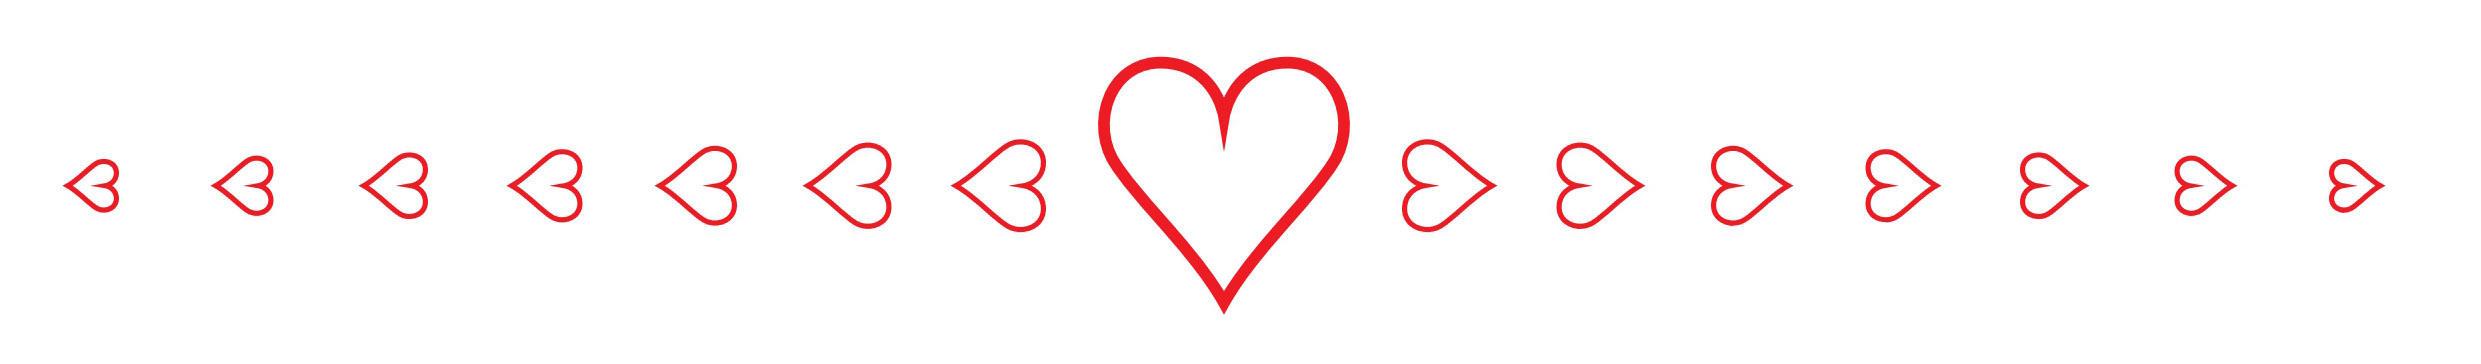 heart-border.jpg